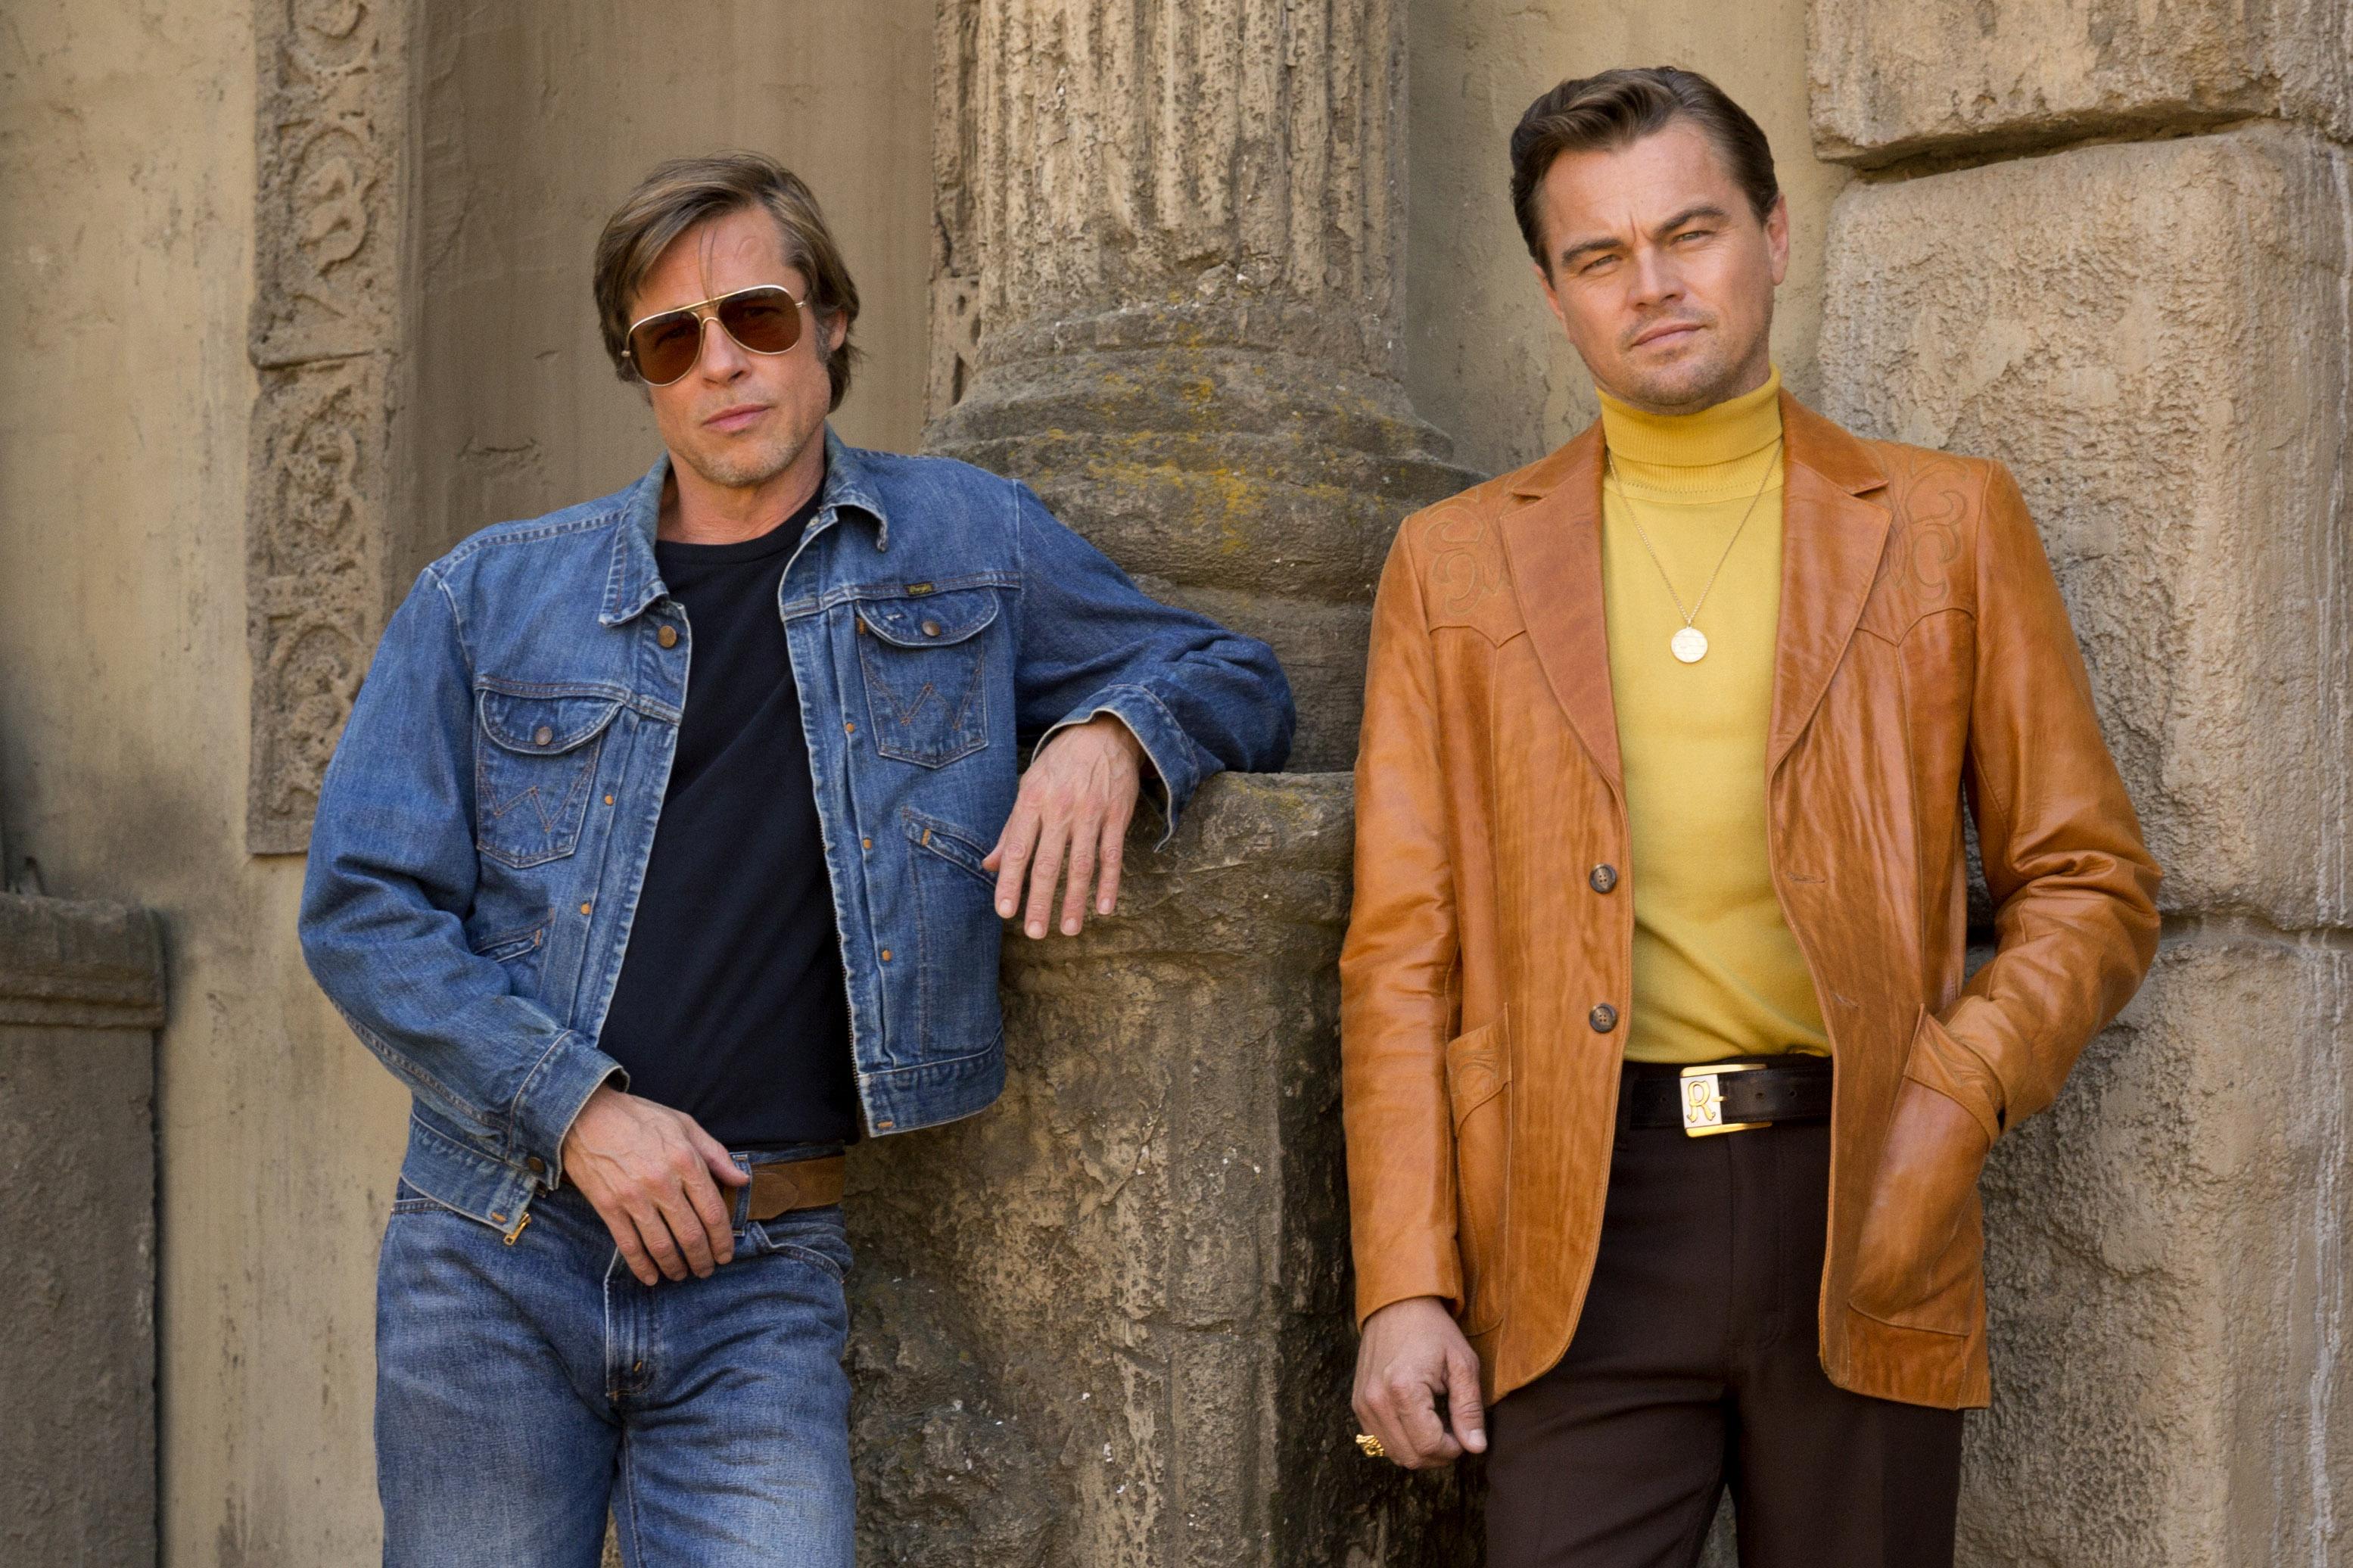 Brad Pitt and Leonardo DiCaprio star in